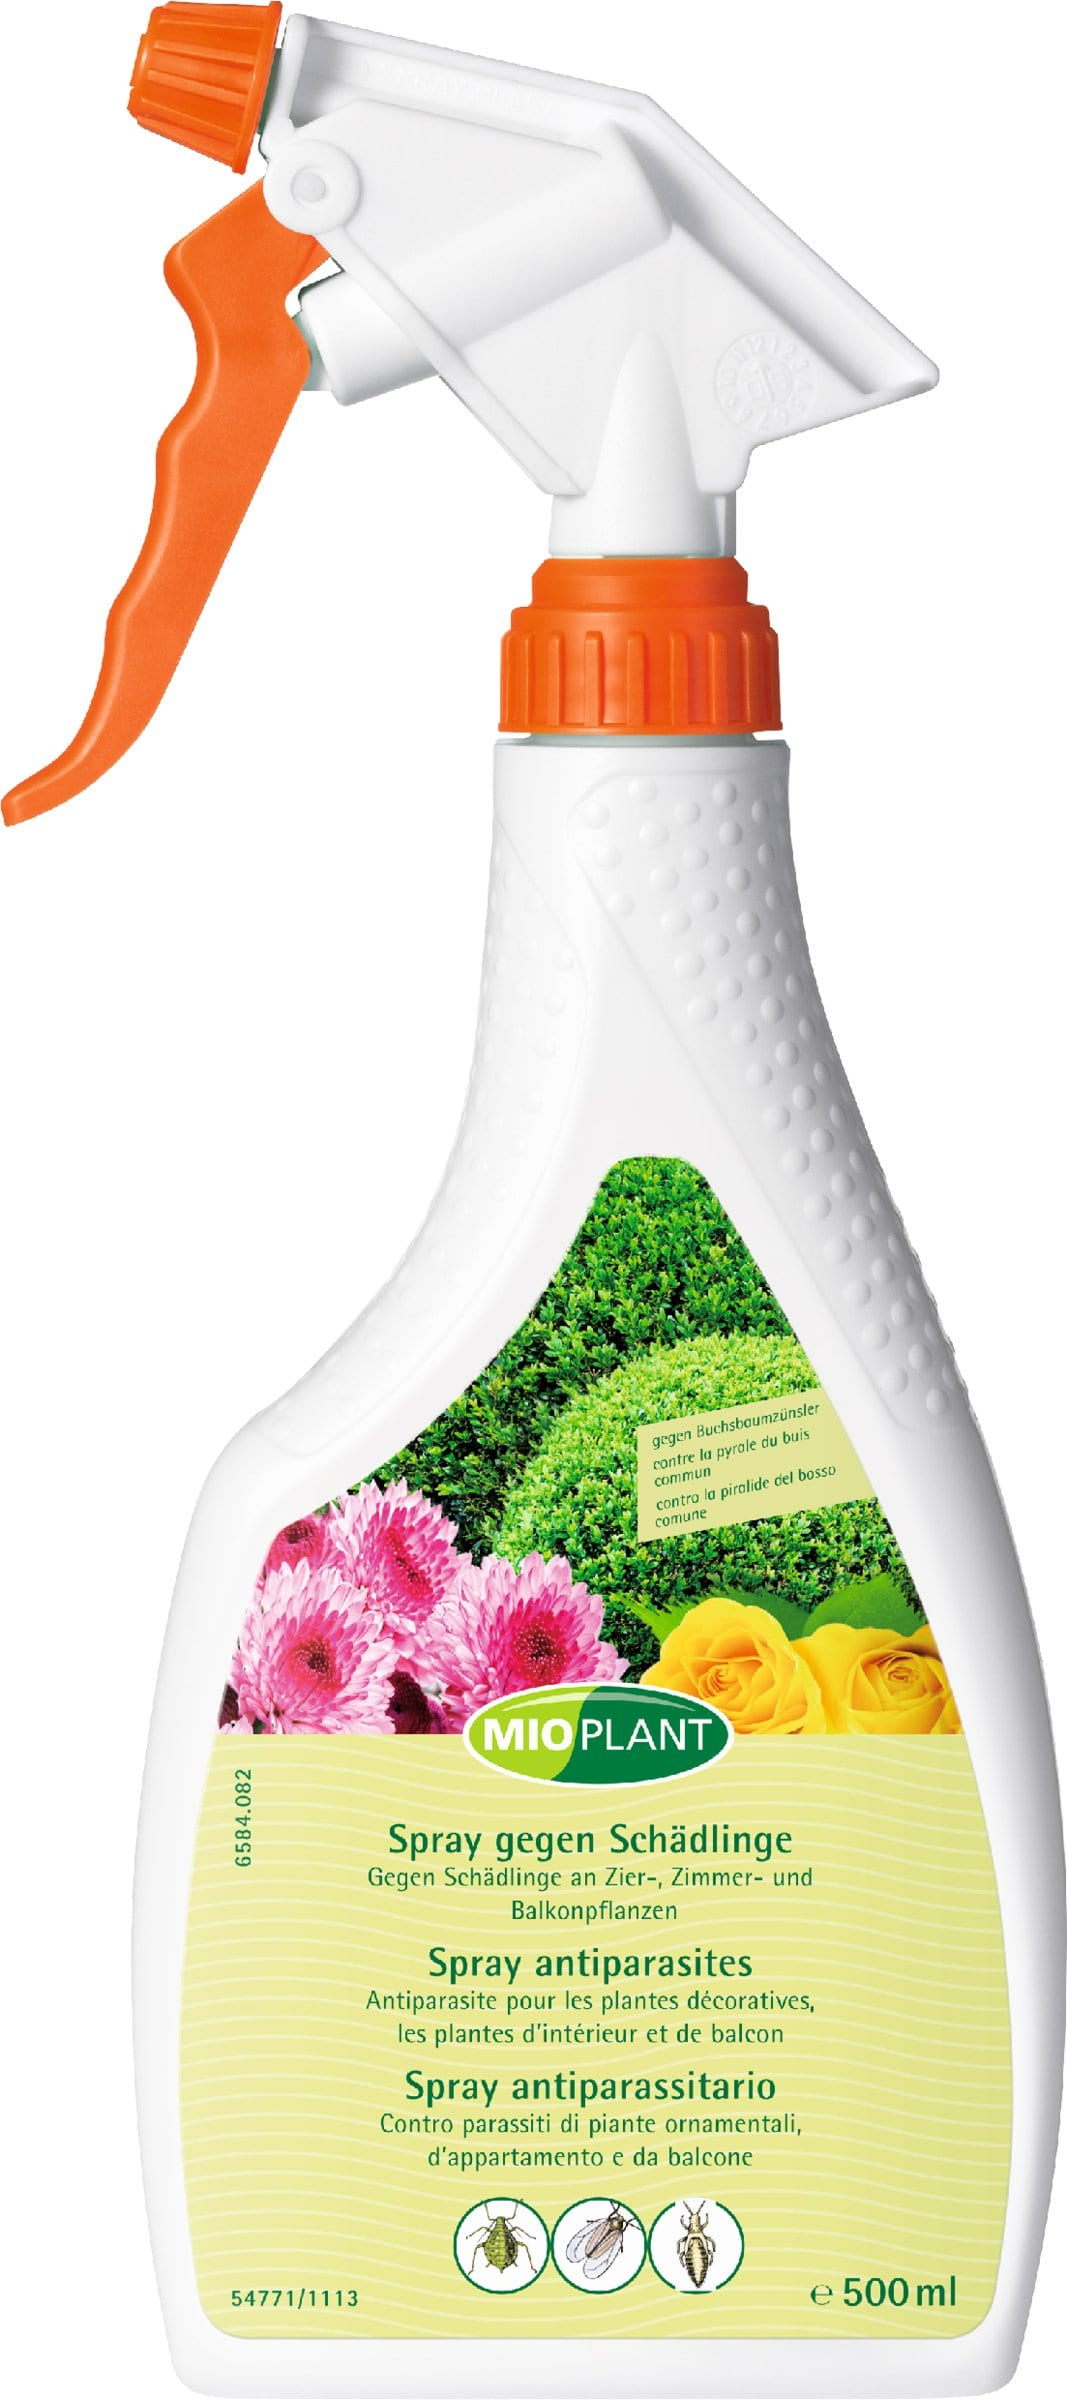 Mioplant Spray antiparasites, 500 ml